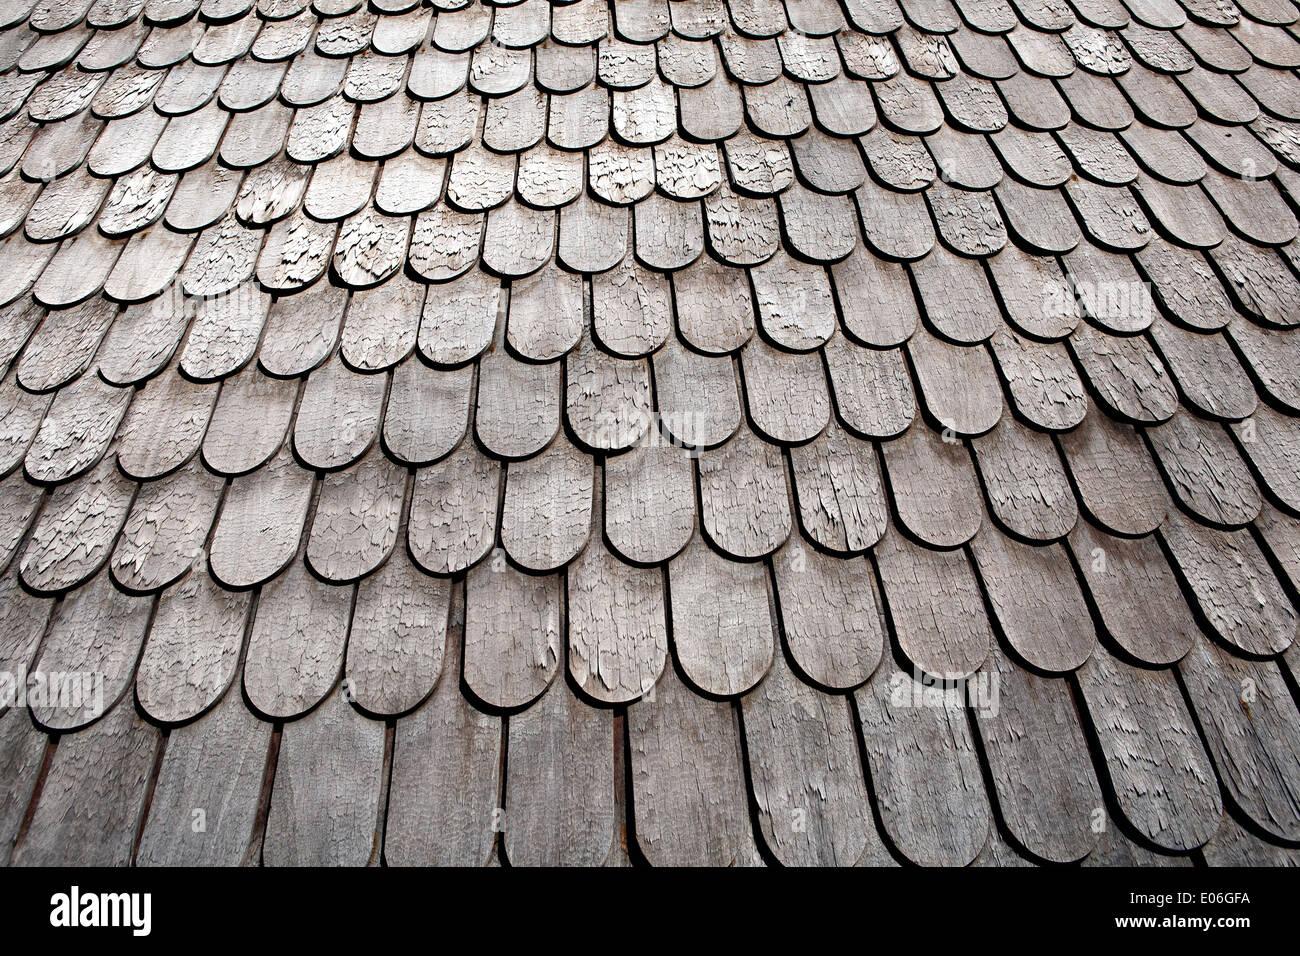 Wood Shingled Roof Shingles Or Shake Shingles In Closeup